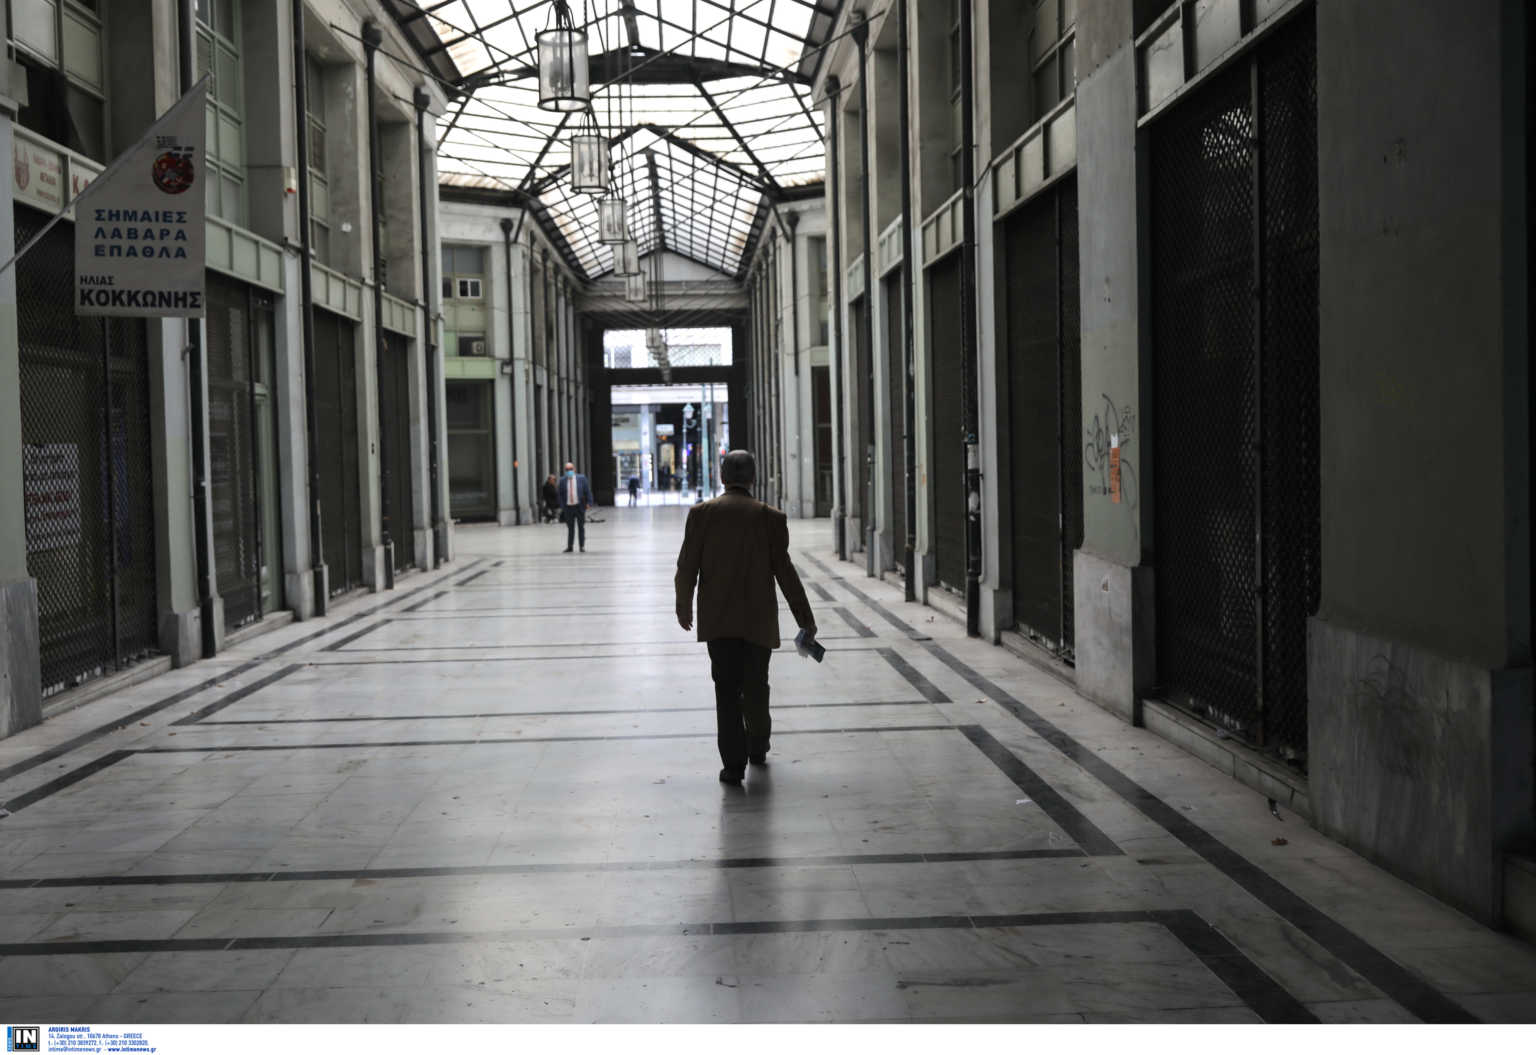 Lockdown στην Αττική: Πότε θα τεθεί σε ισχύ – Ποια μέτρα θα εφαρμοστούν